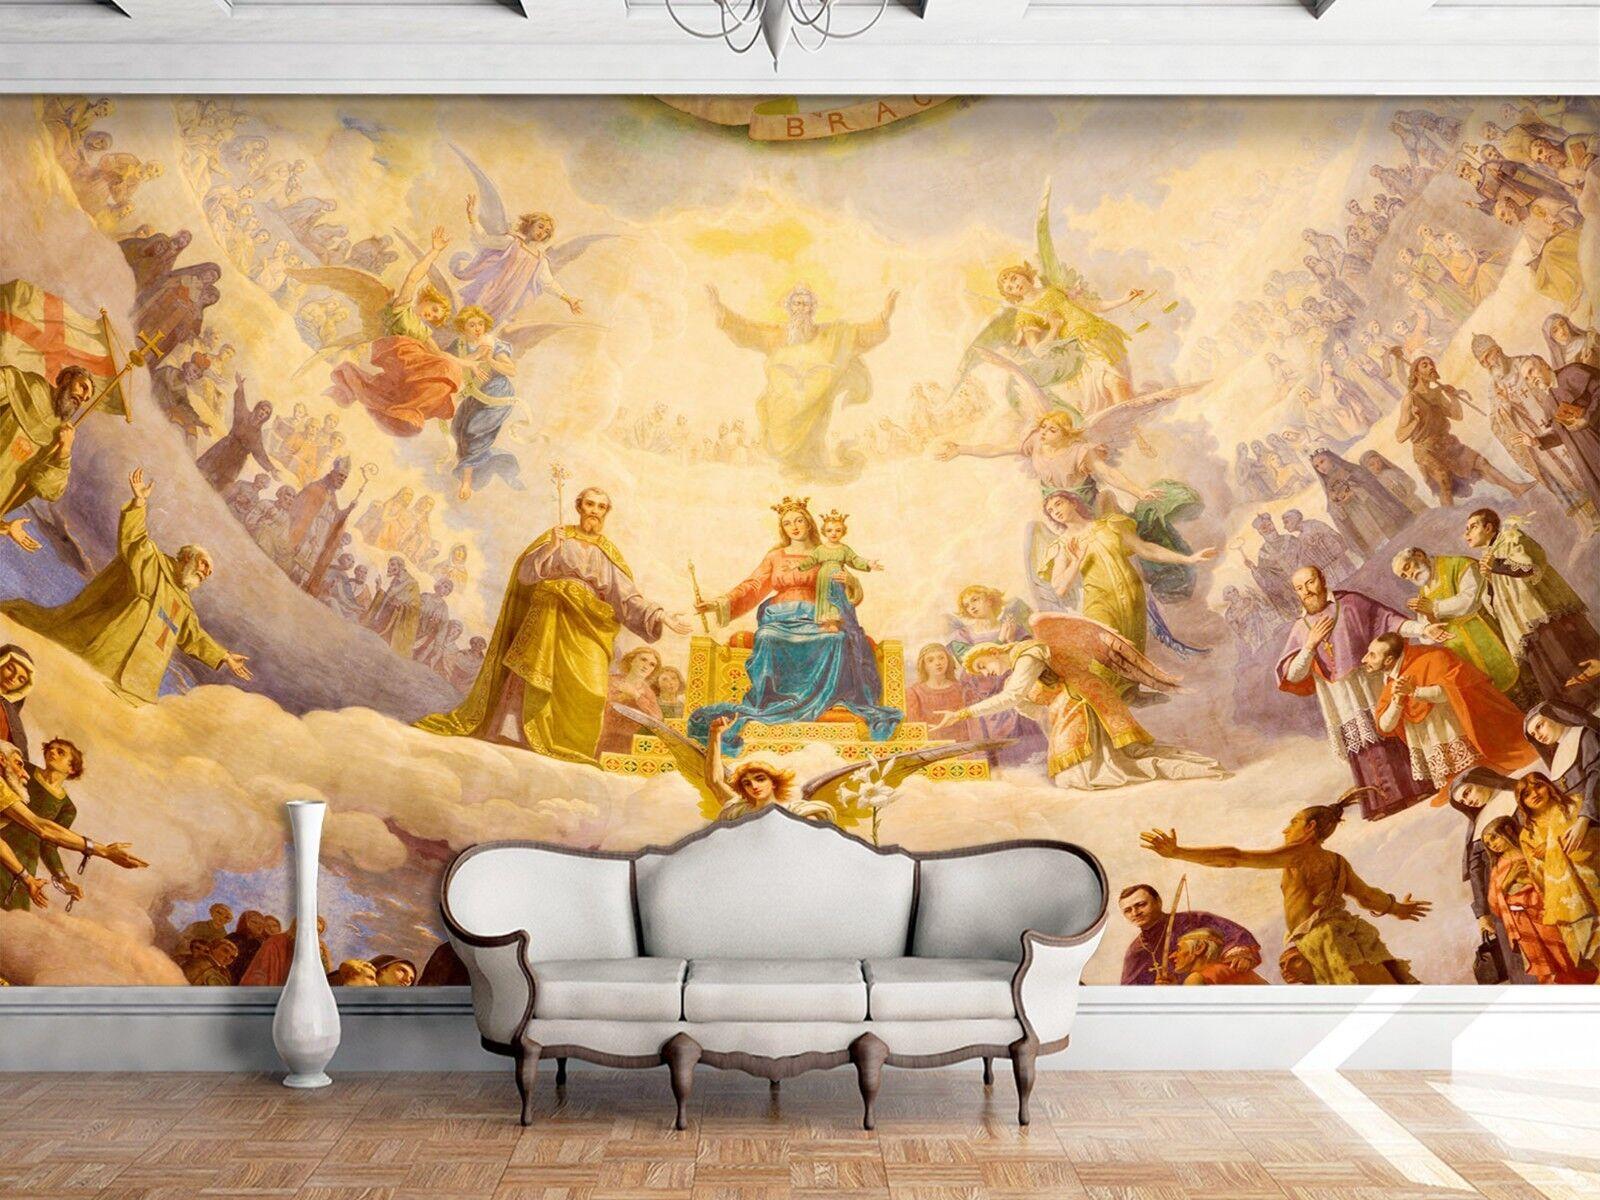 3D Engel Königreich 78 Tapete Wandgemälde Tapete Tapeten Familie Kinde DE